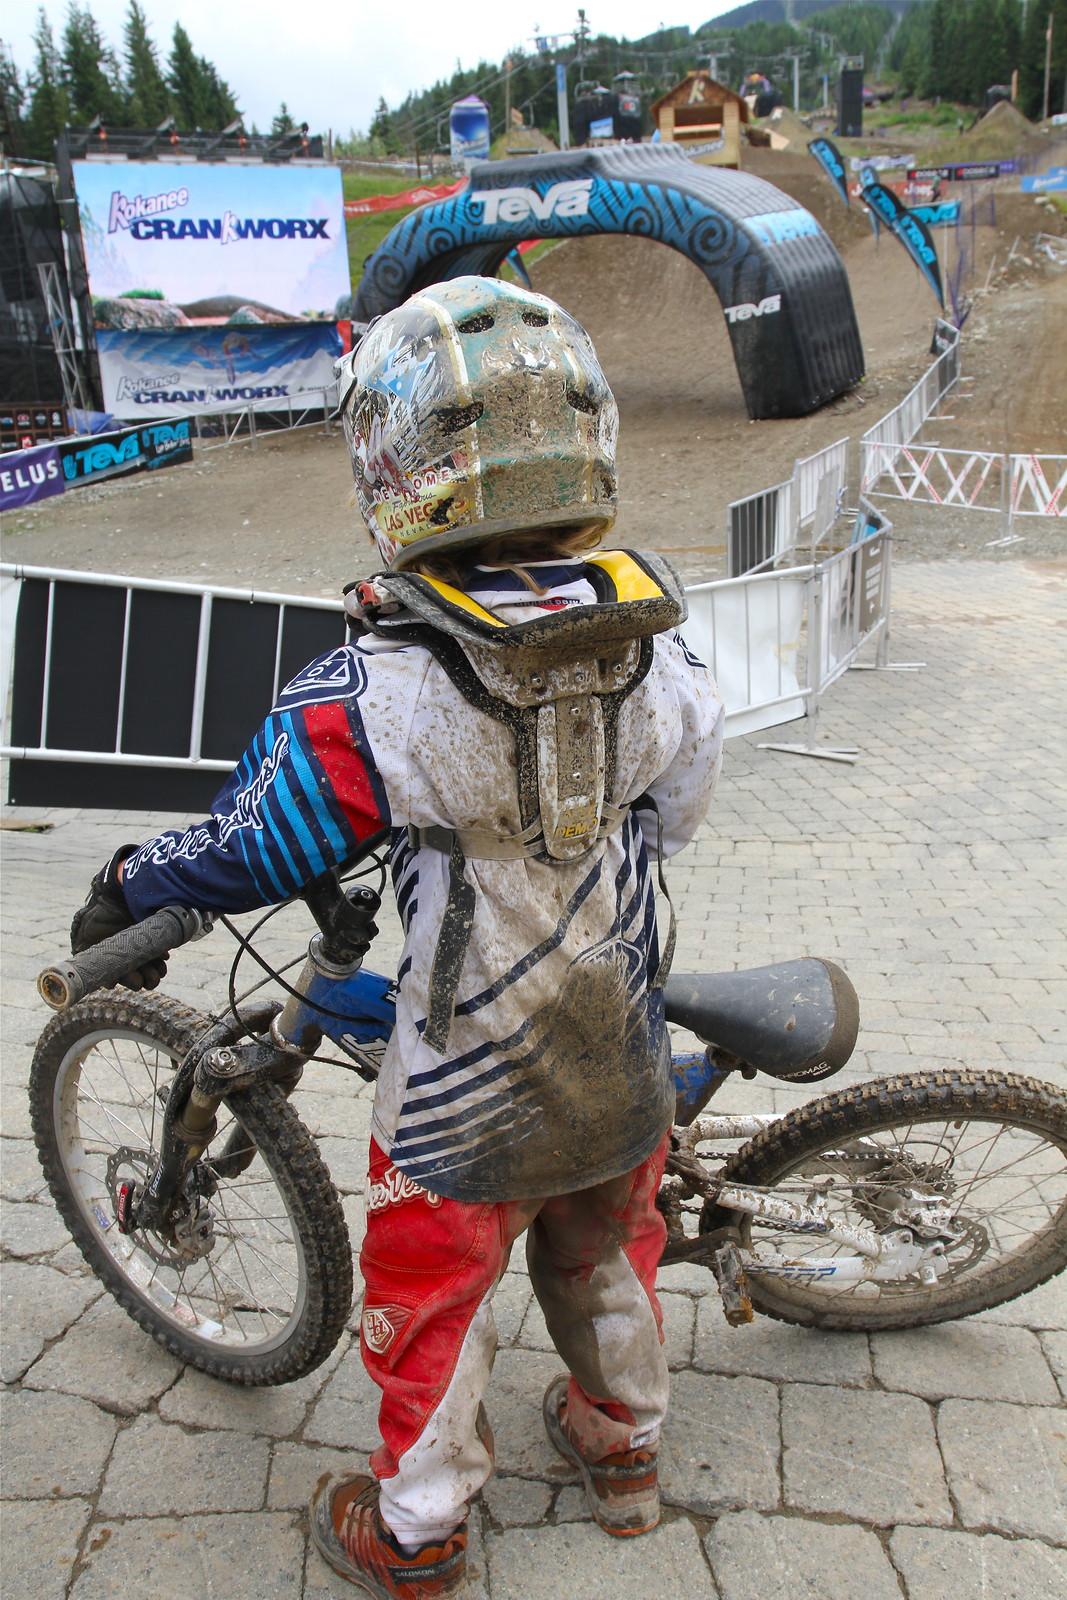 Jackson Goldstone - Malcolm Mclaws - Mountain Biking Pictures - Vital MTB